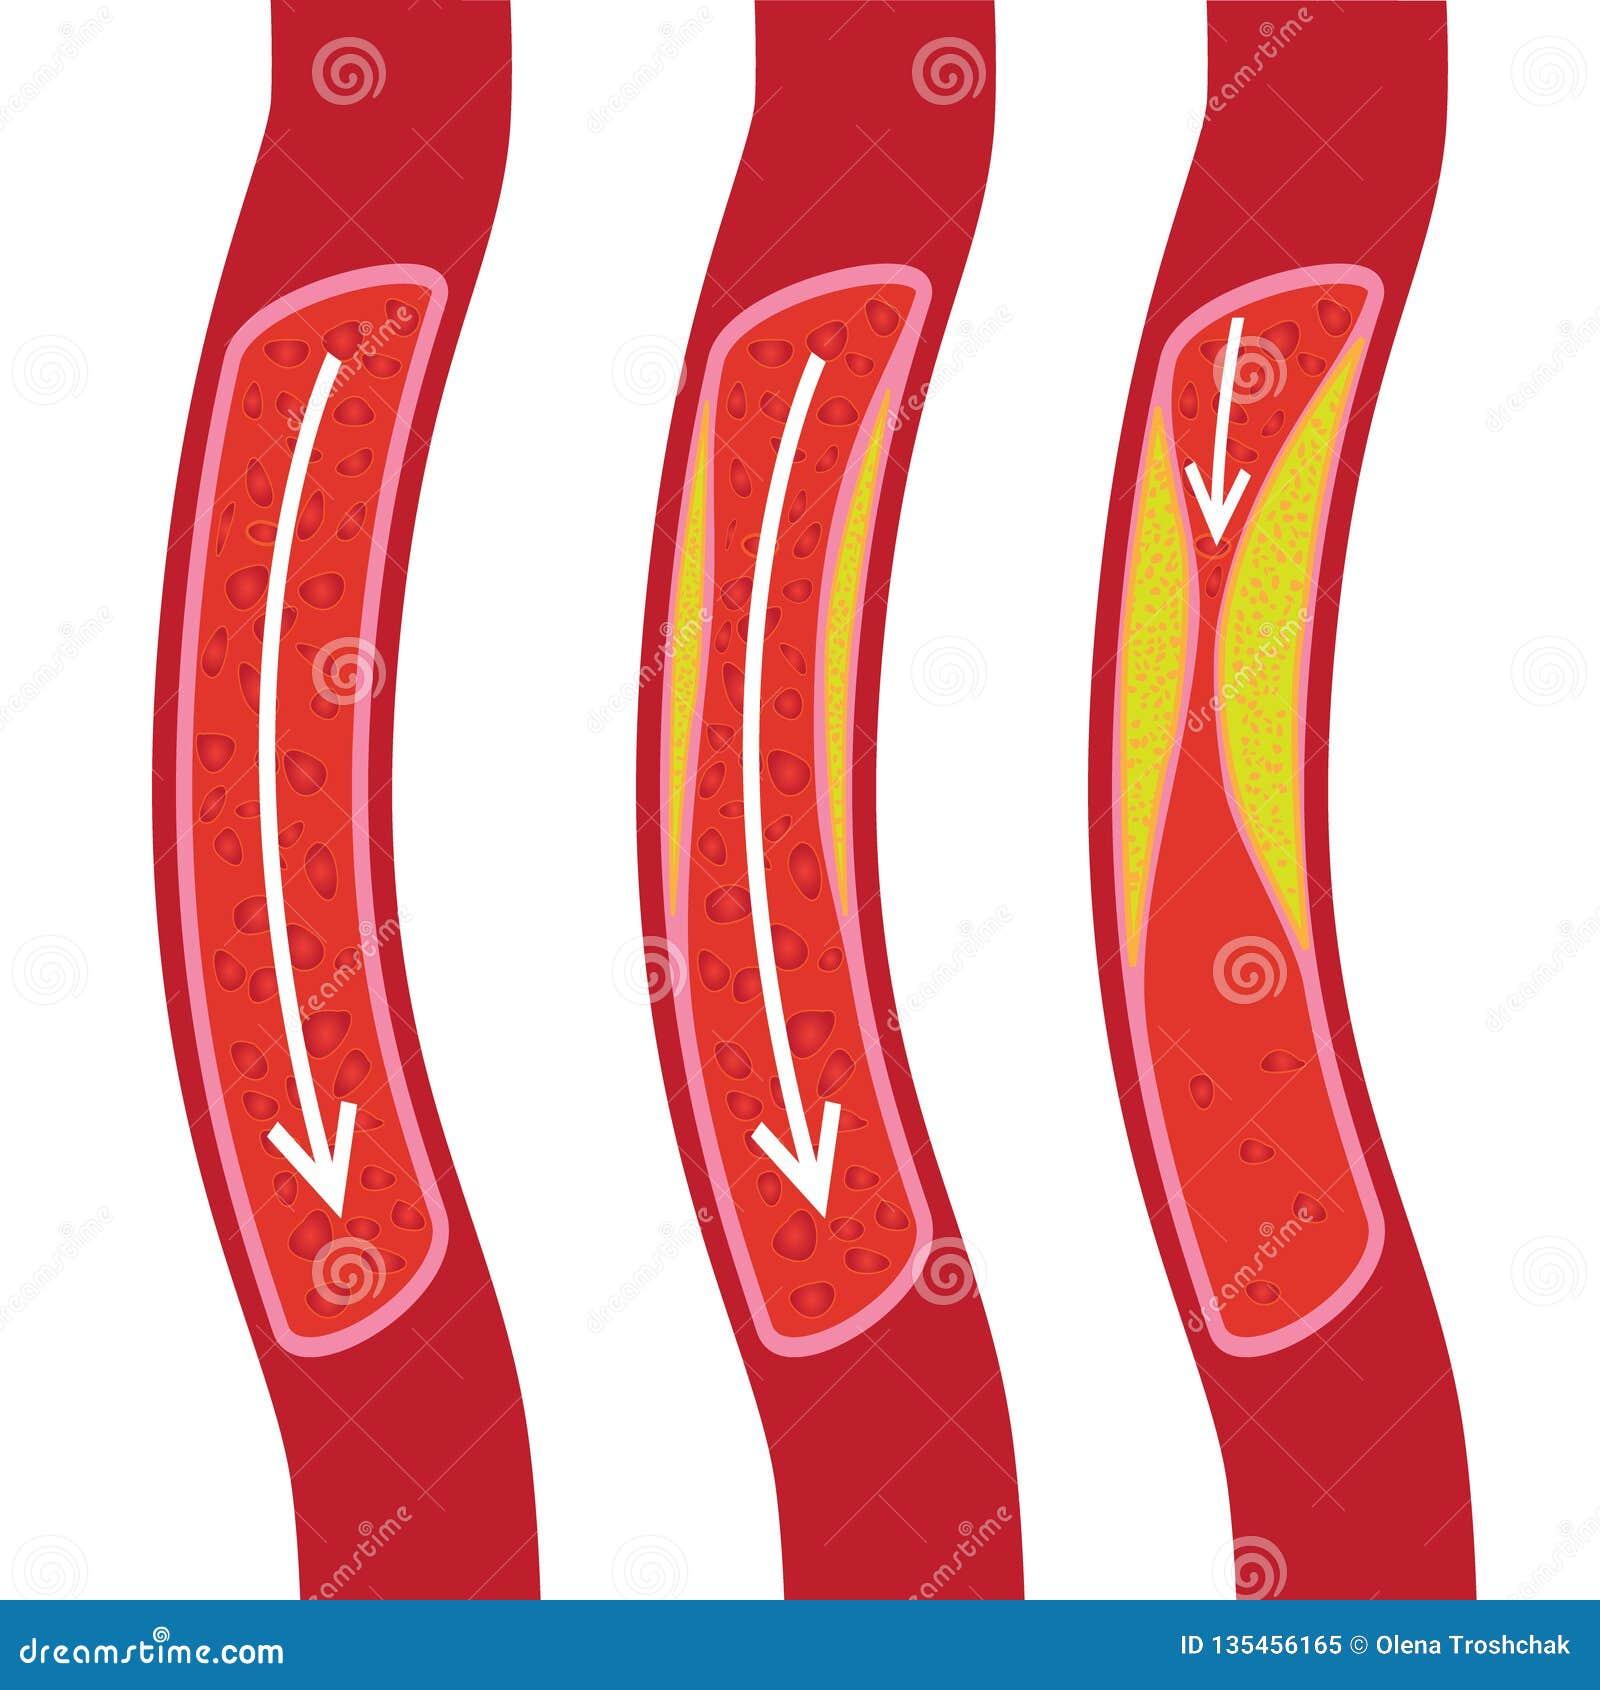 Vaso sanguíneo saudável, em parte obstruído e ilustração obstruída do vaso sanguíneo